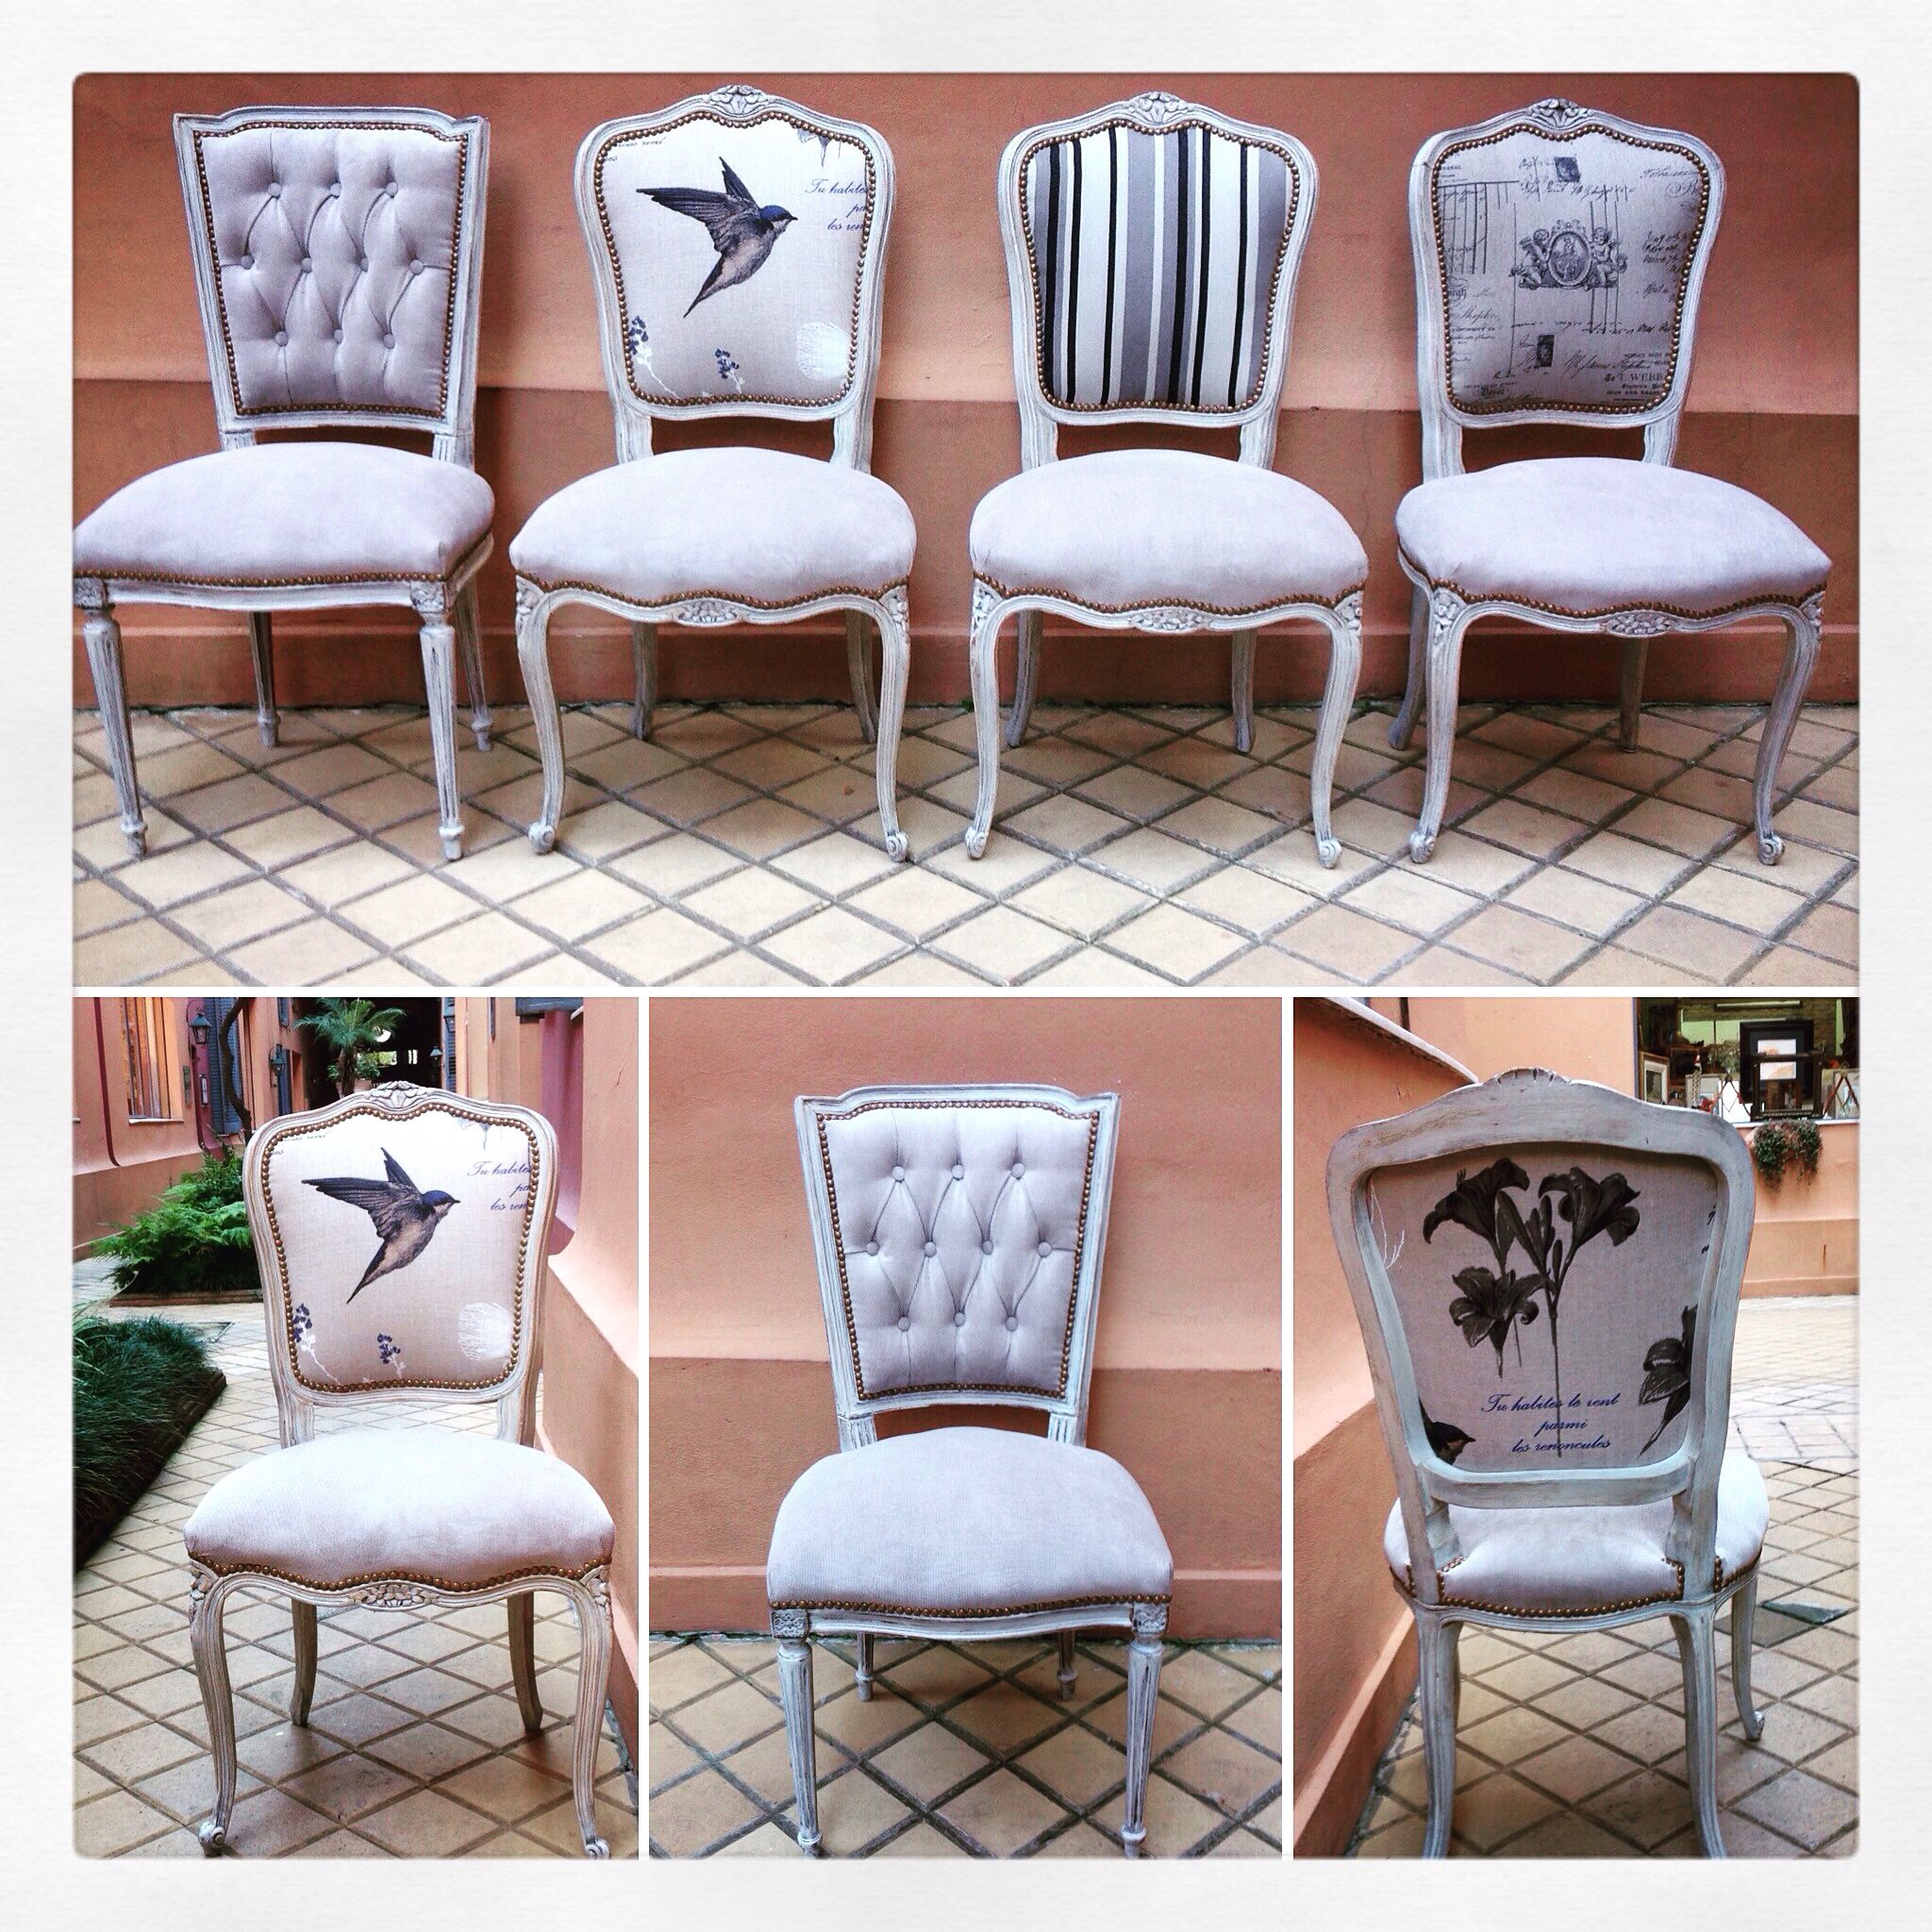 Sillas francesas combinadas dom pinterest upholstery for Sillas modernas vintage